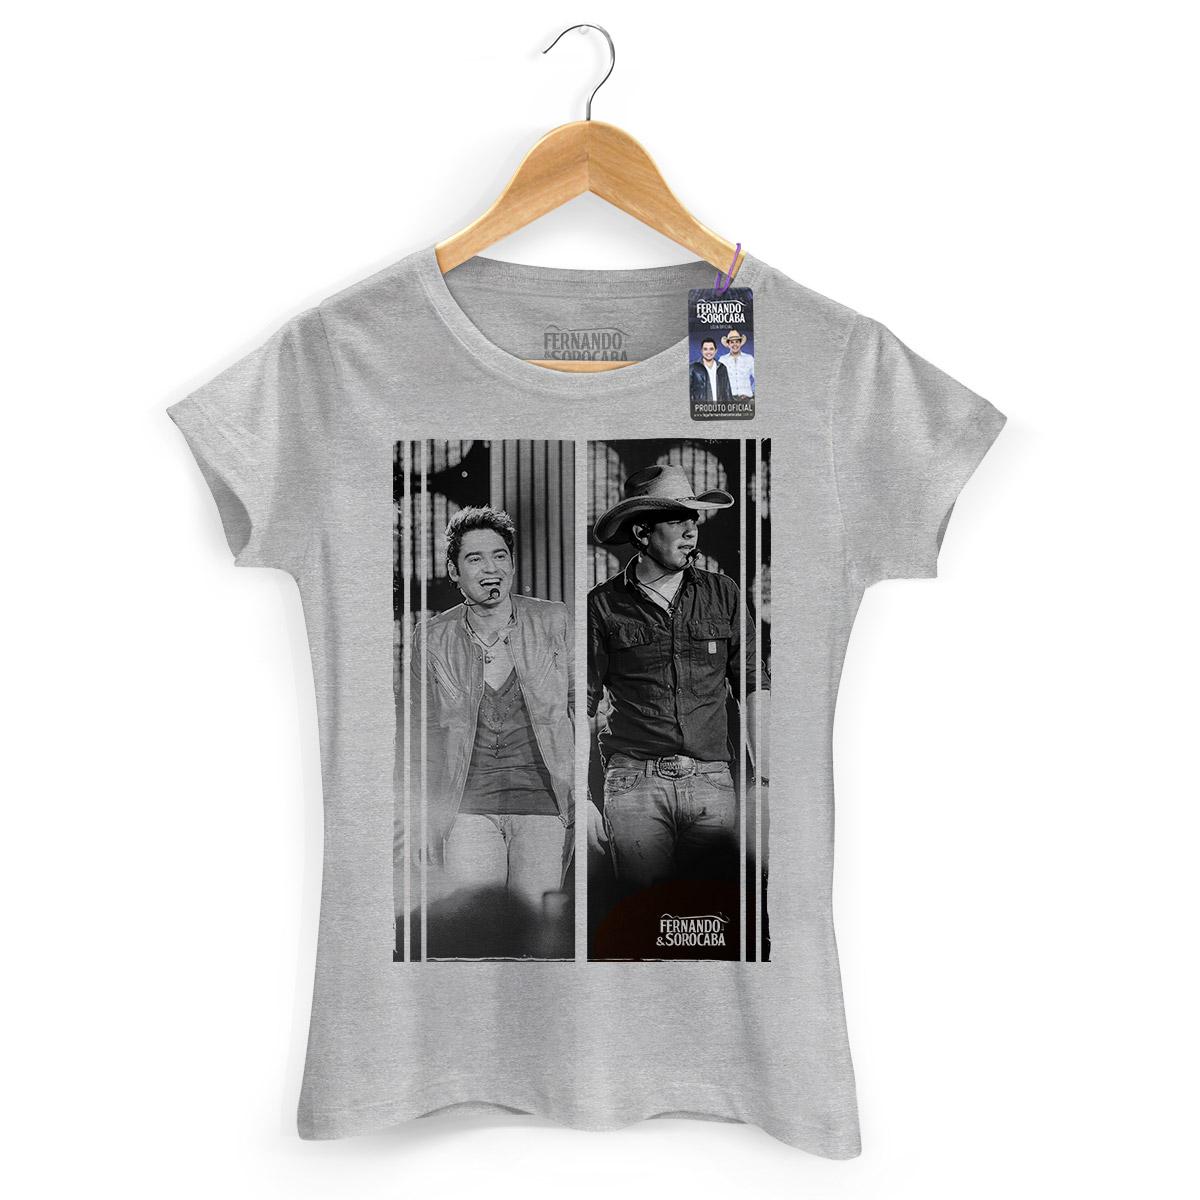 Camiseta Feminina Fernando & Sorocaba Foto